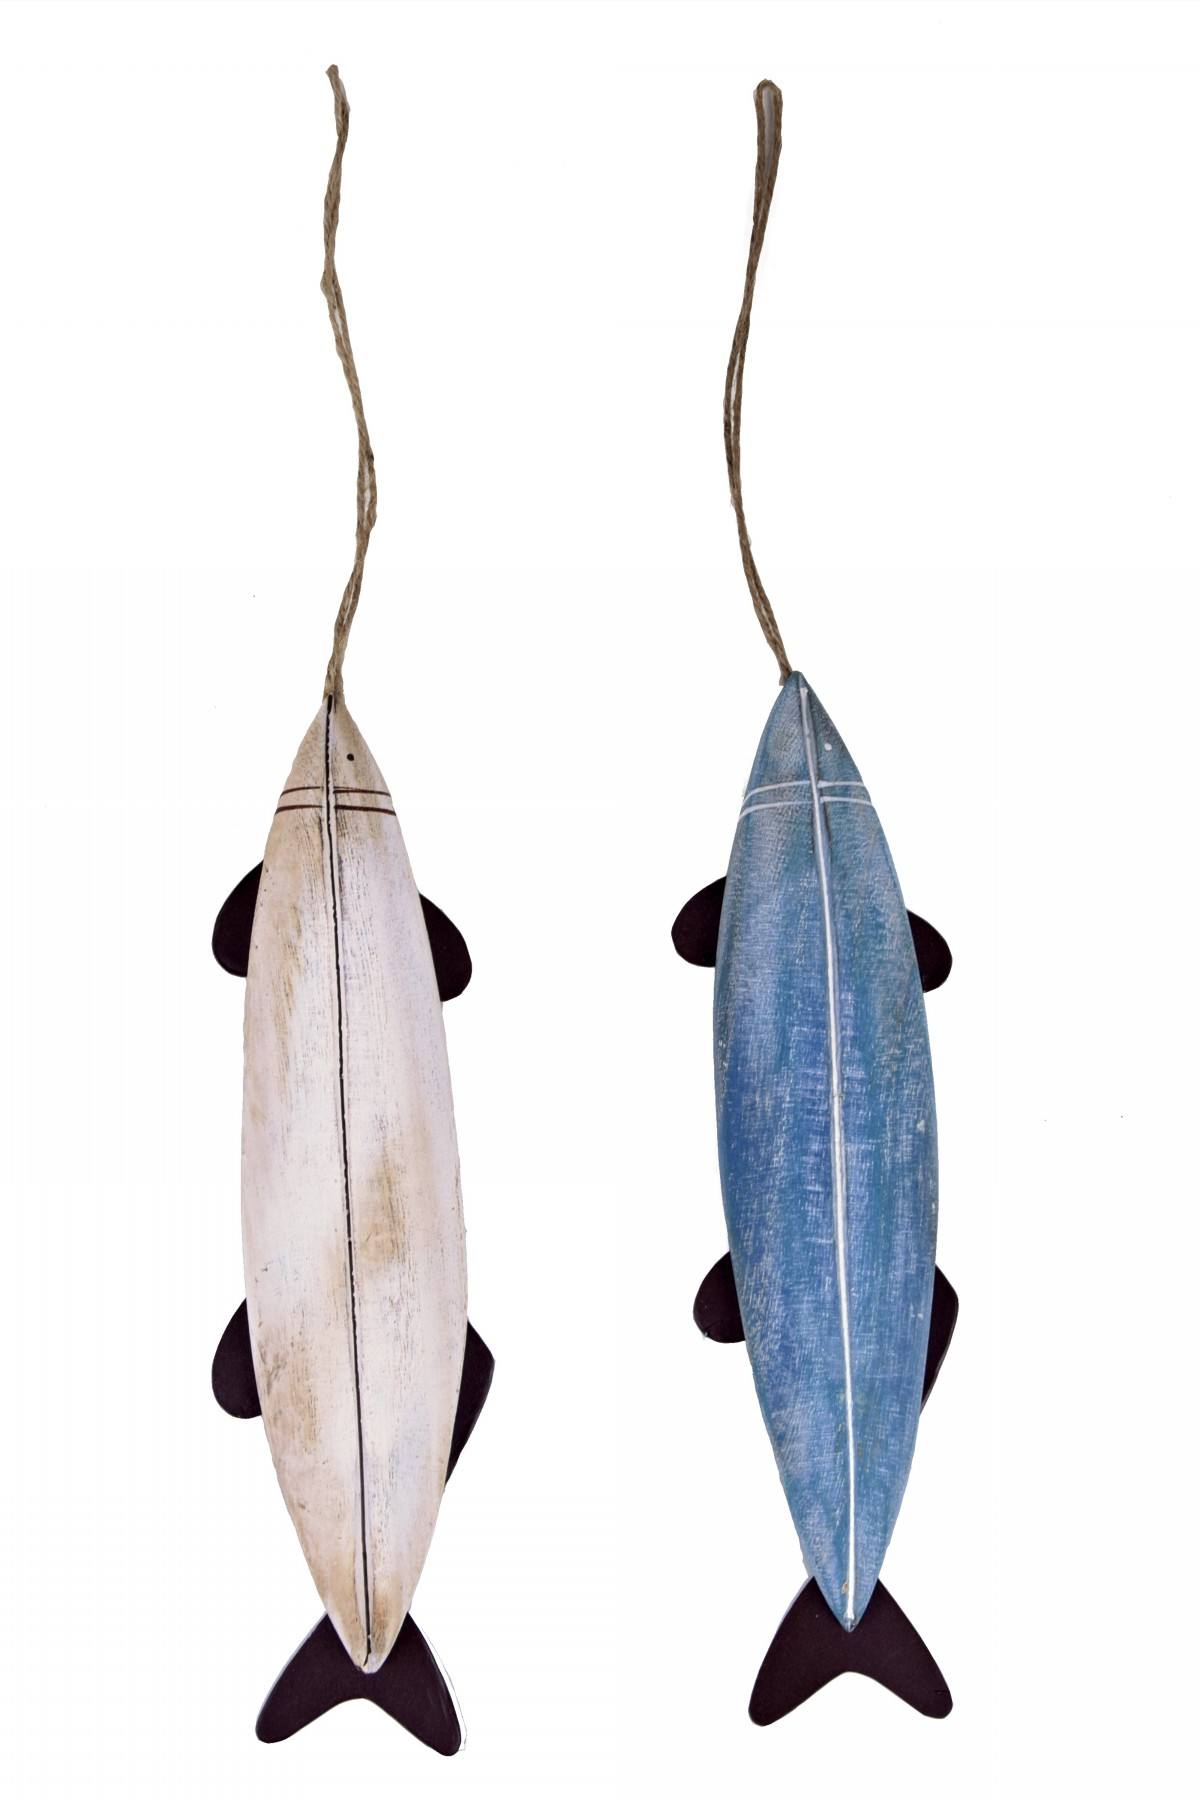 Dekorace ryba bílá a modrá 21x6x1cm Barva: bílá